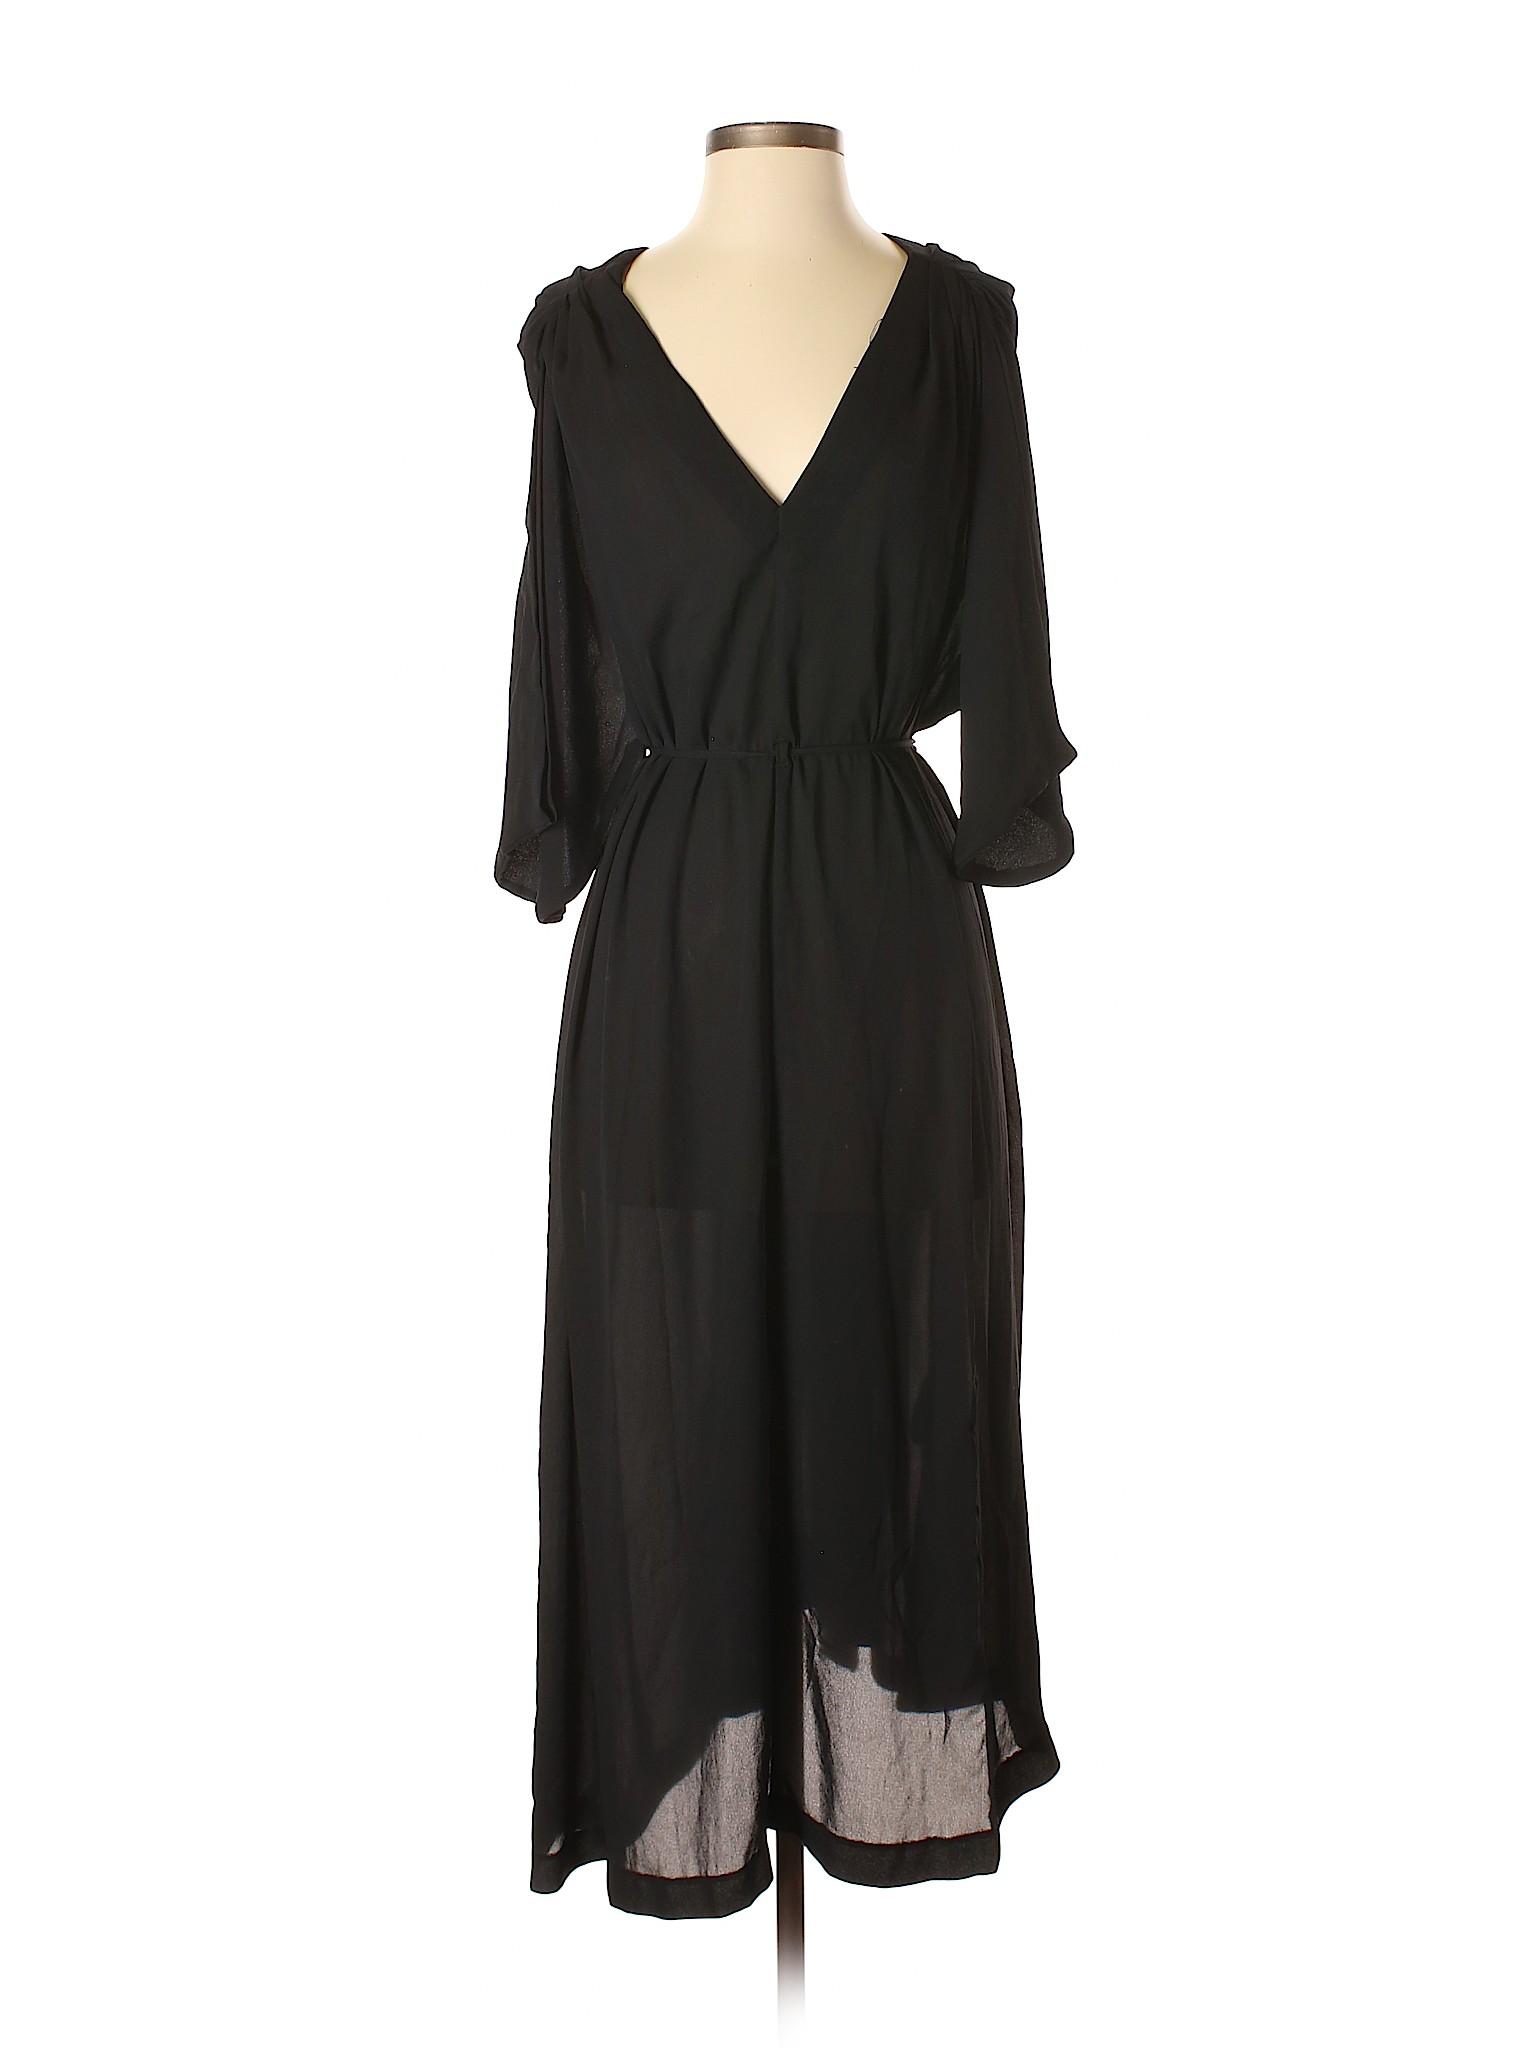 Selling amp;M H Casual Dress H amp;M amp;M Casual Dress Casual Dress Selling amp;M H H Selling Selling qnwHXAn8